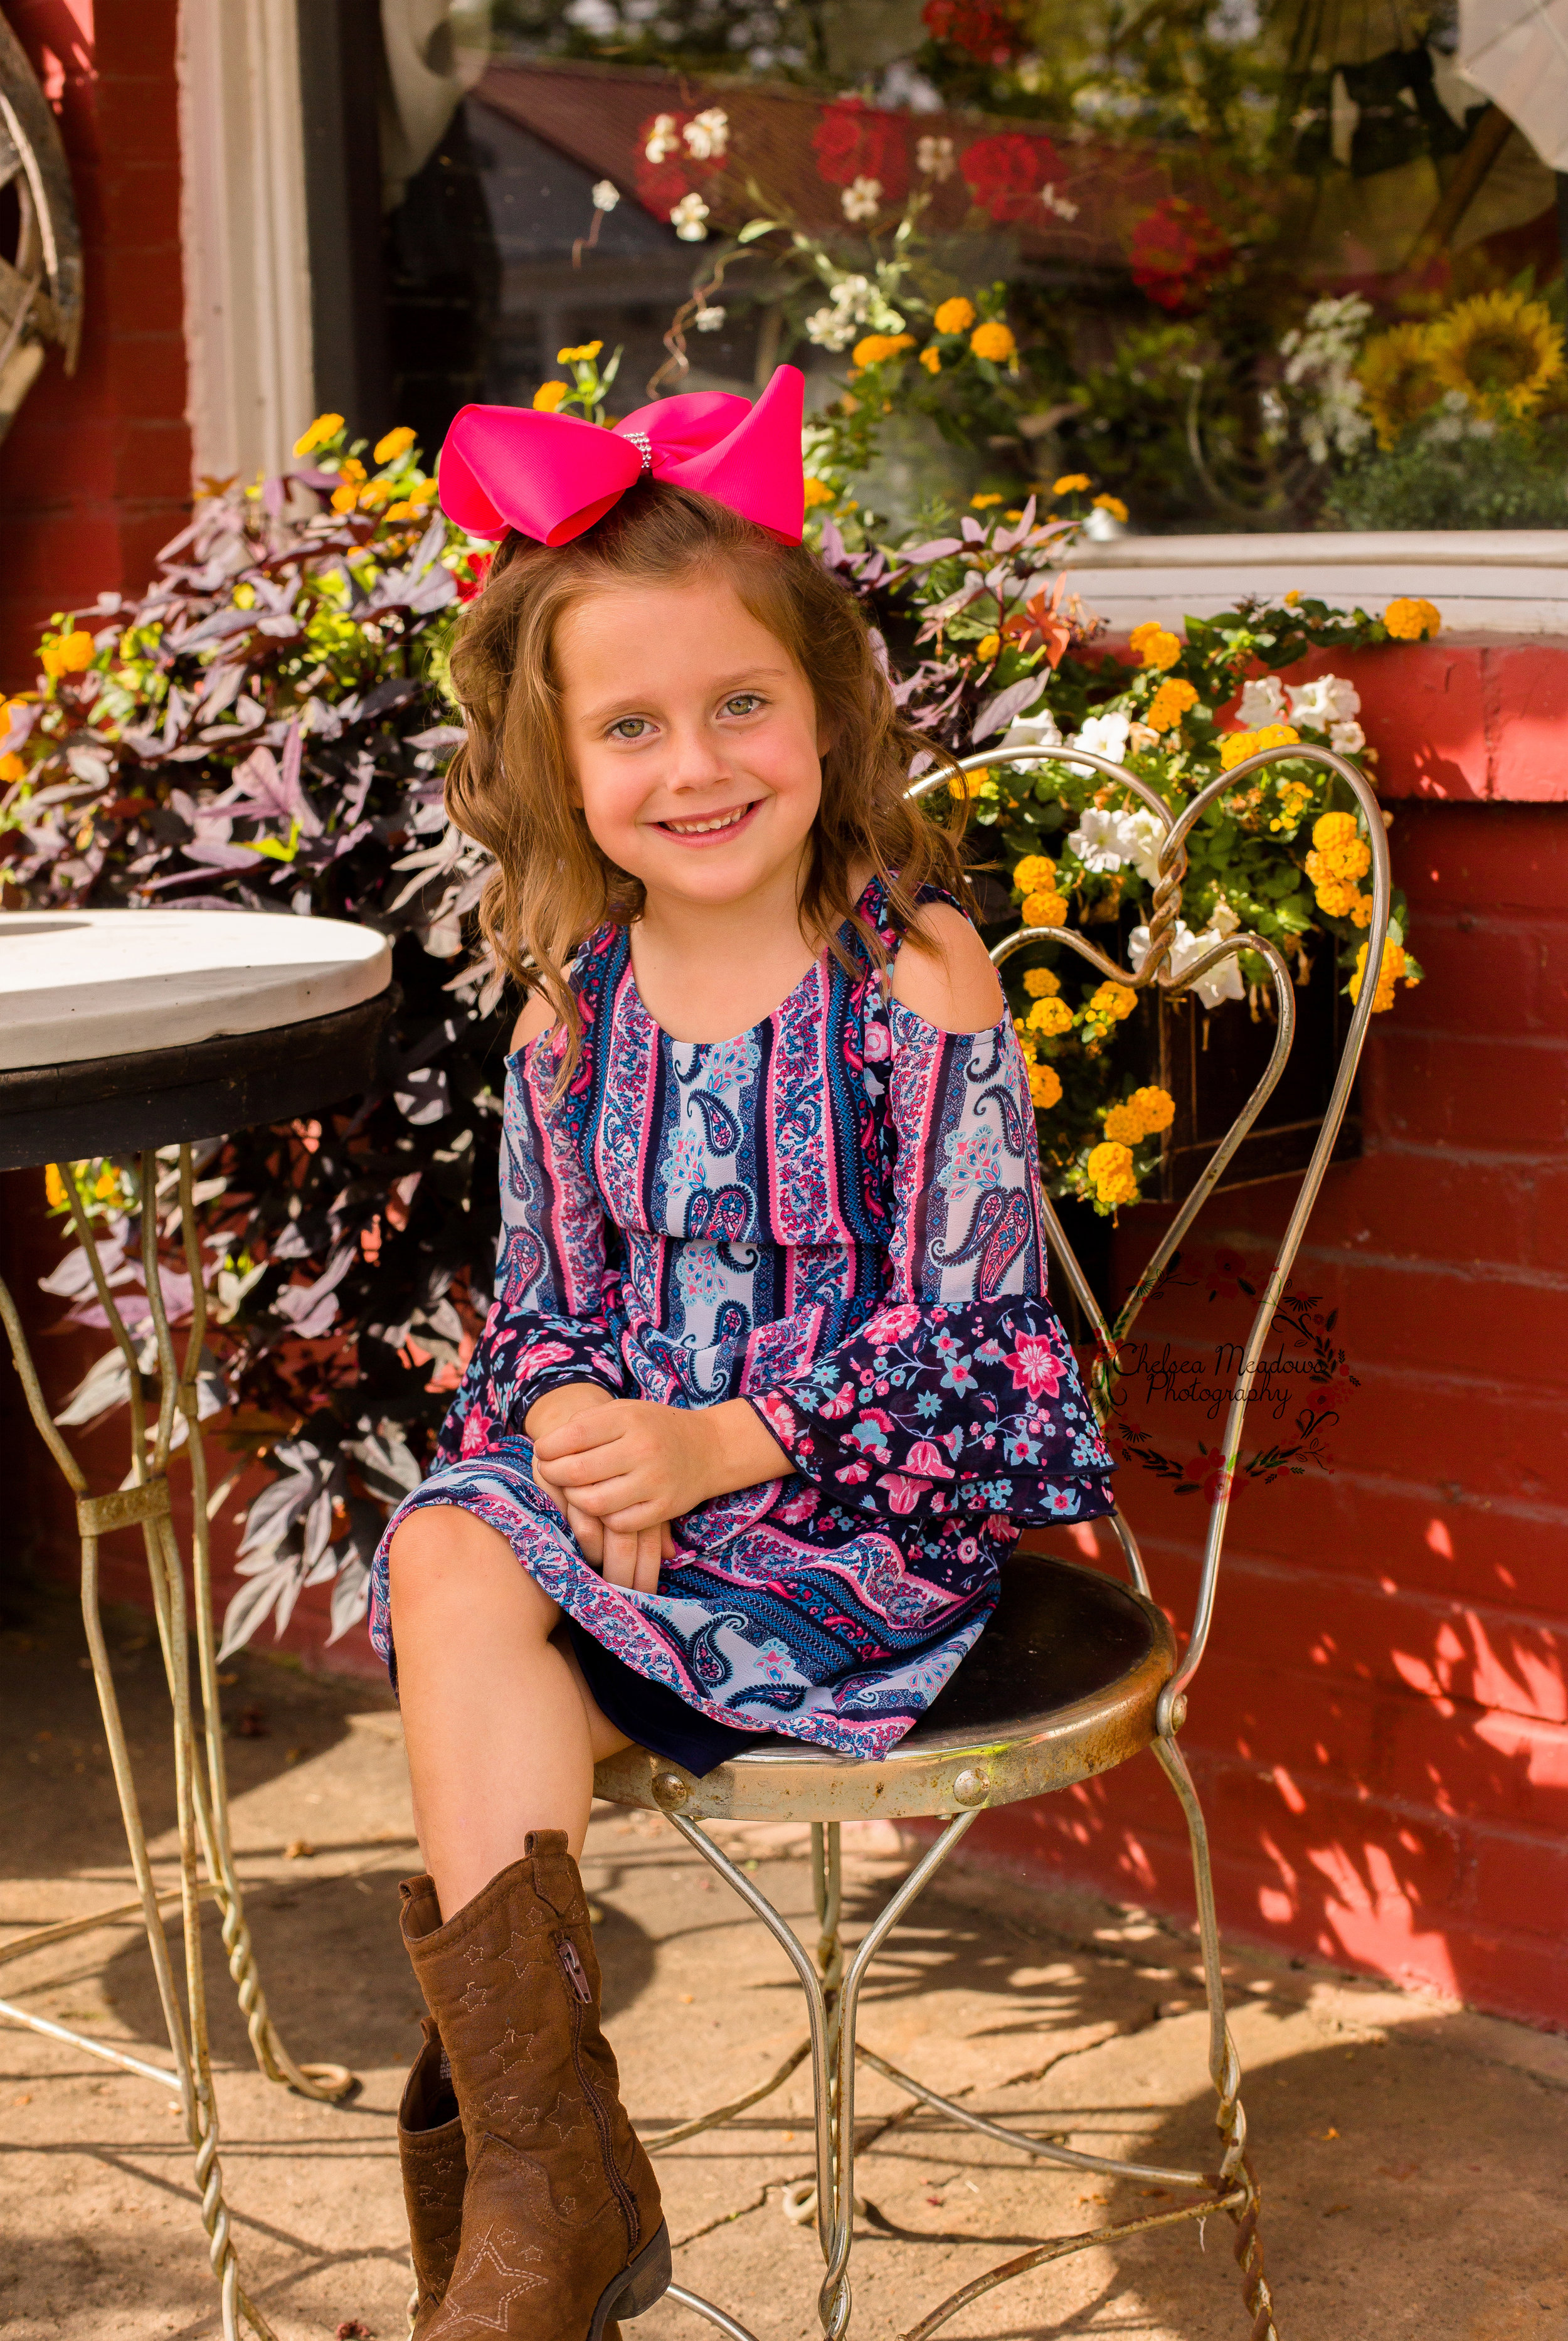 April 6th Birthday - Nashville Family Photographer - Chelsea Meadows Photography (29).jpg